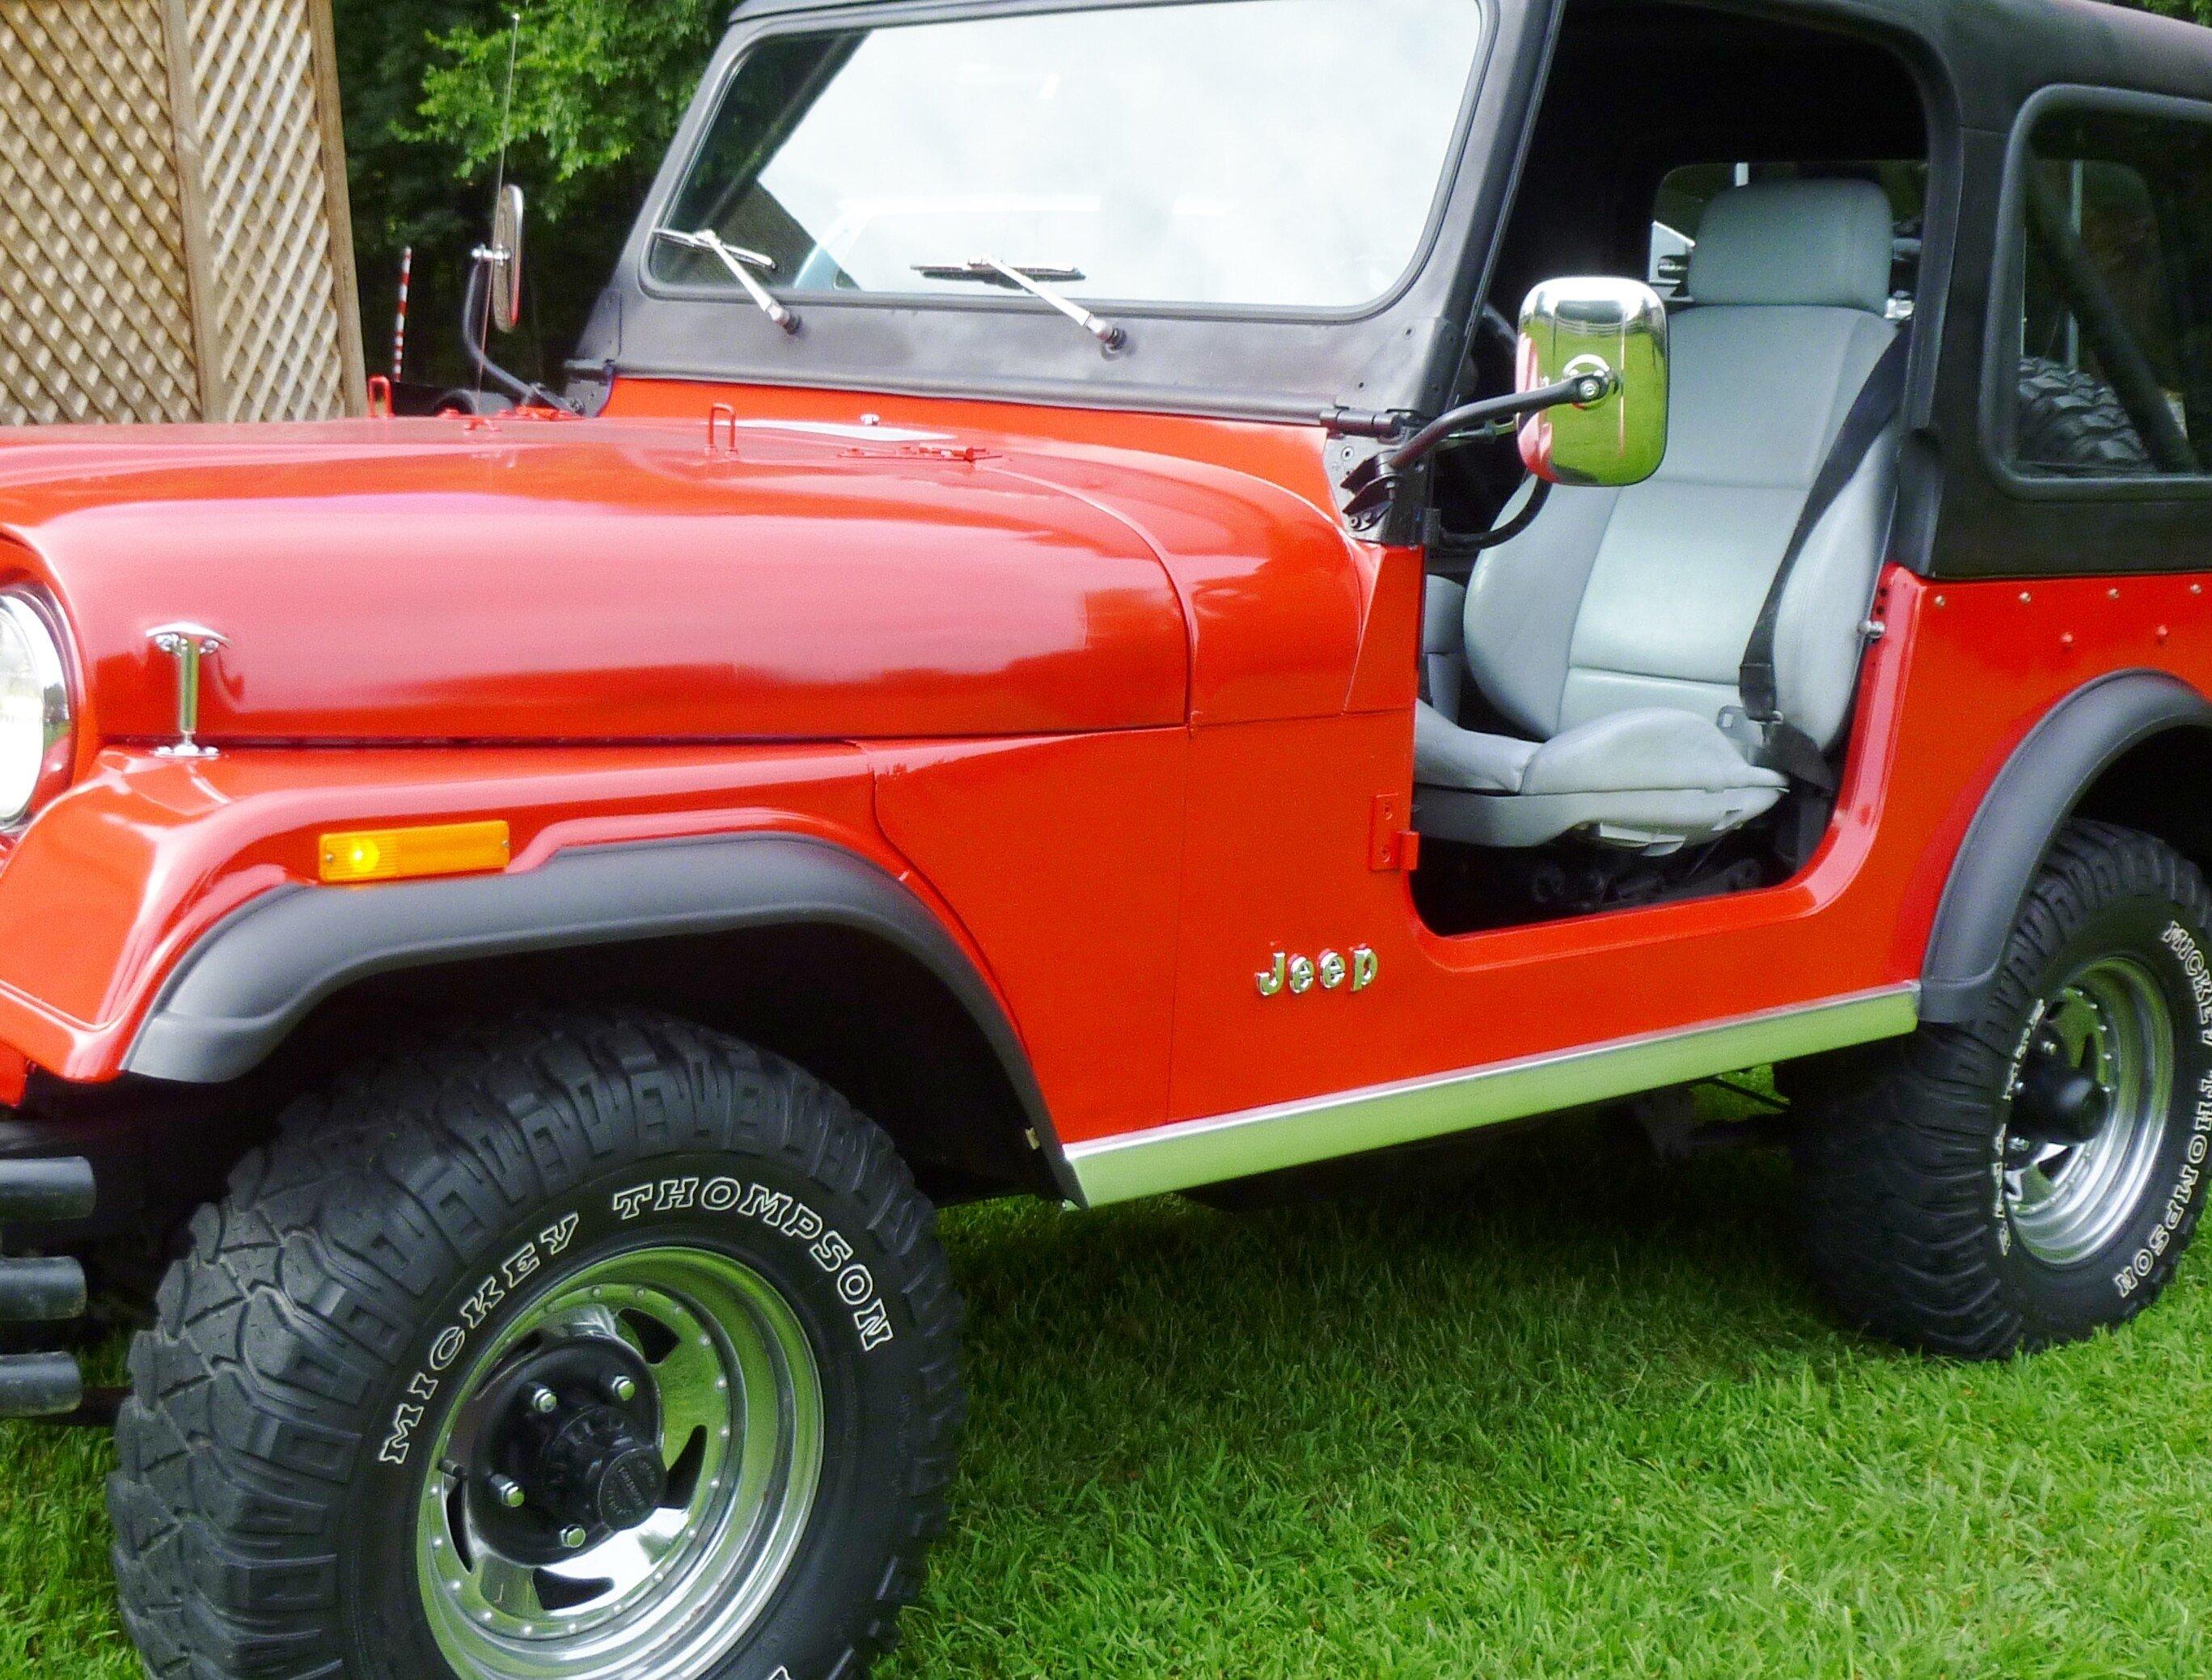 Jeep C7 Laredo 1986 1:43 IXO MODELL AUTO DIECAST CLC189